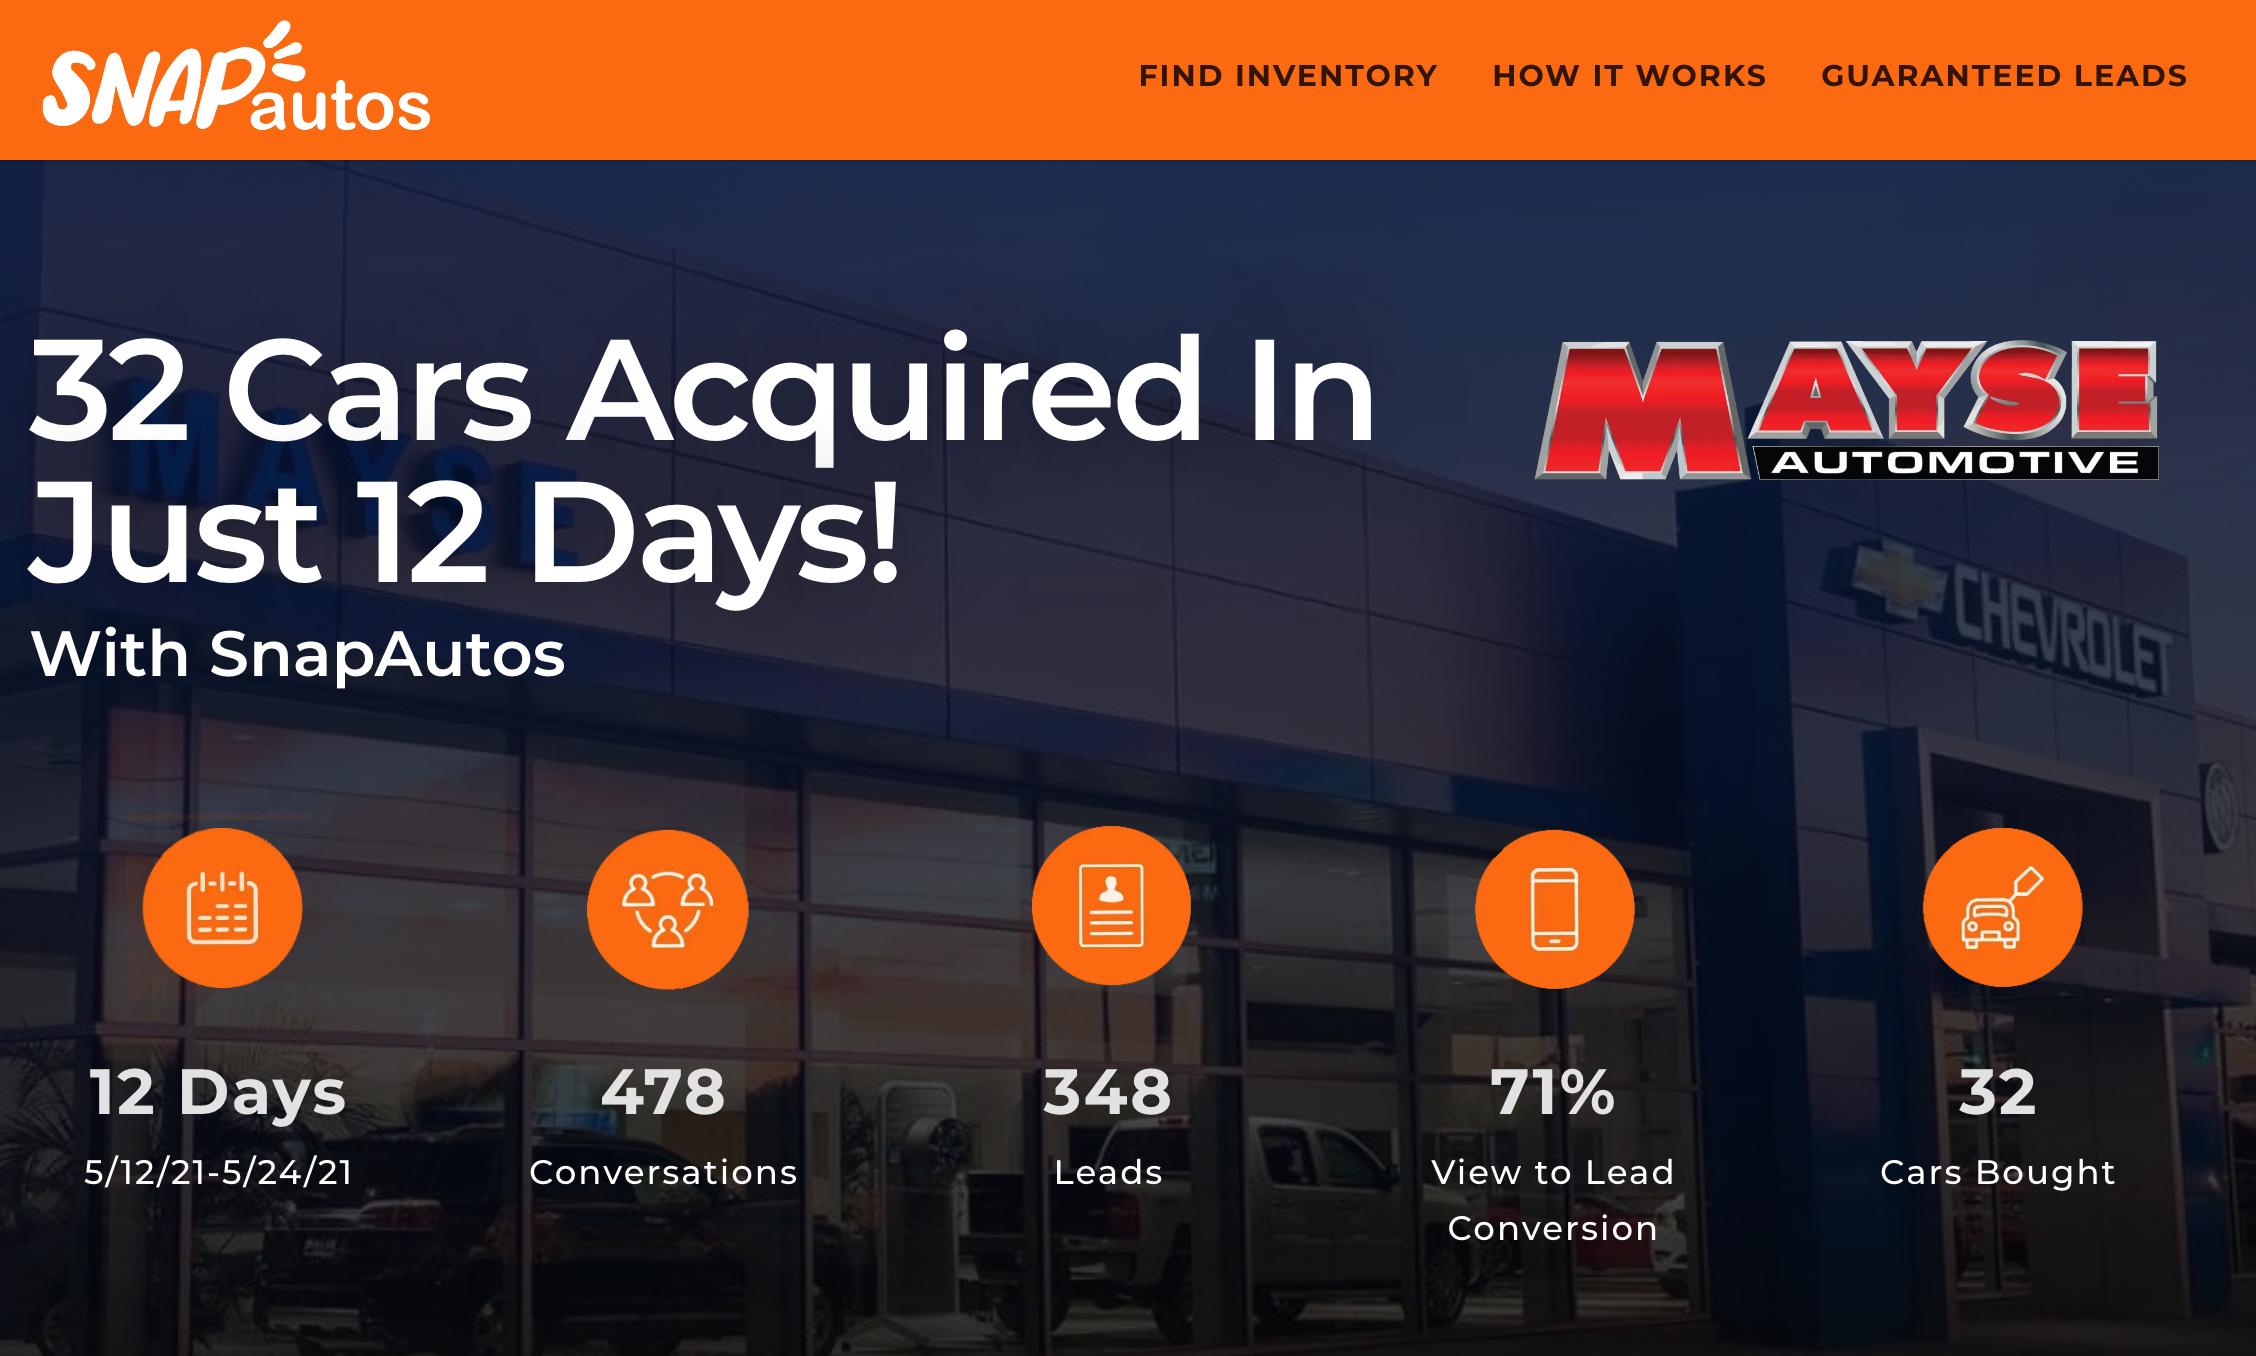 mayse automotive success with snapautos